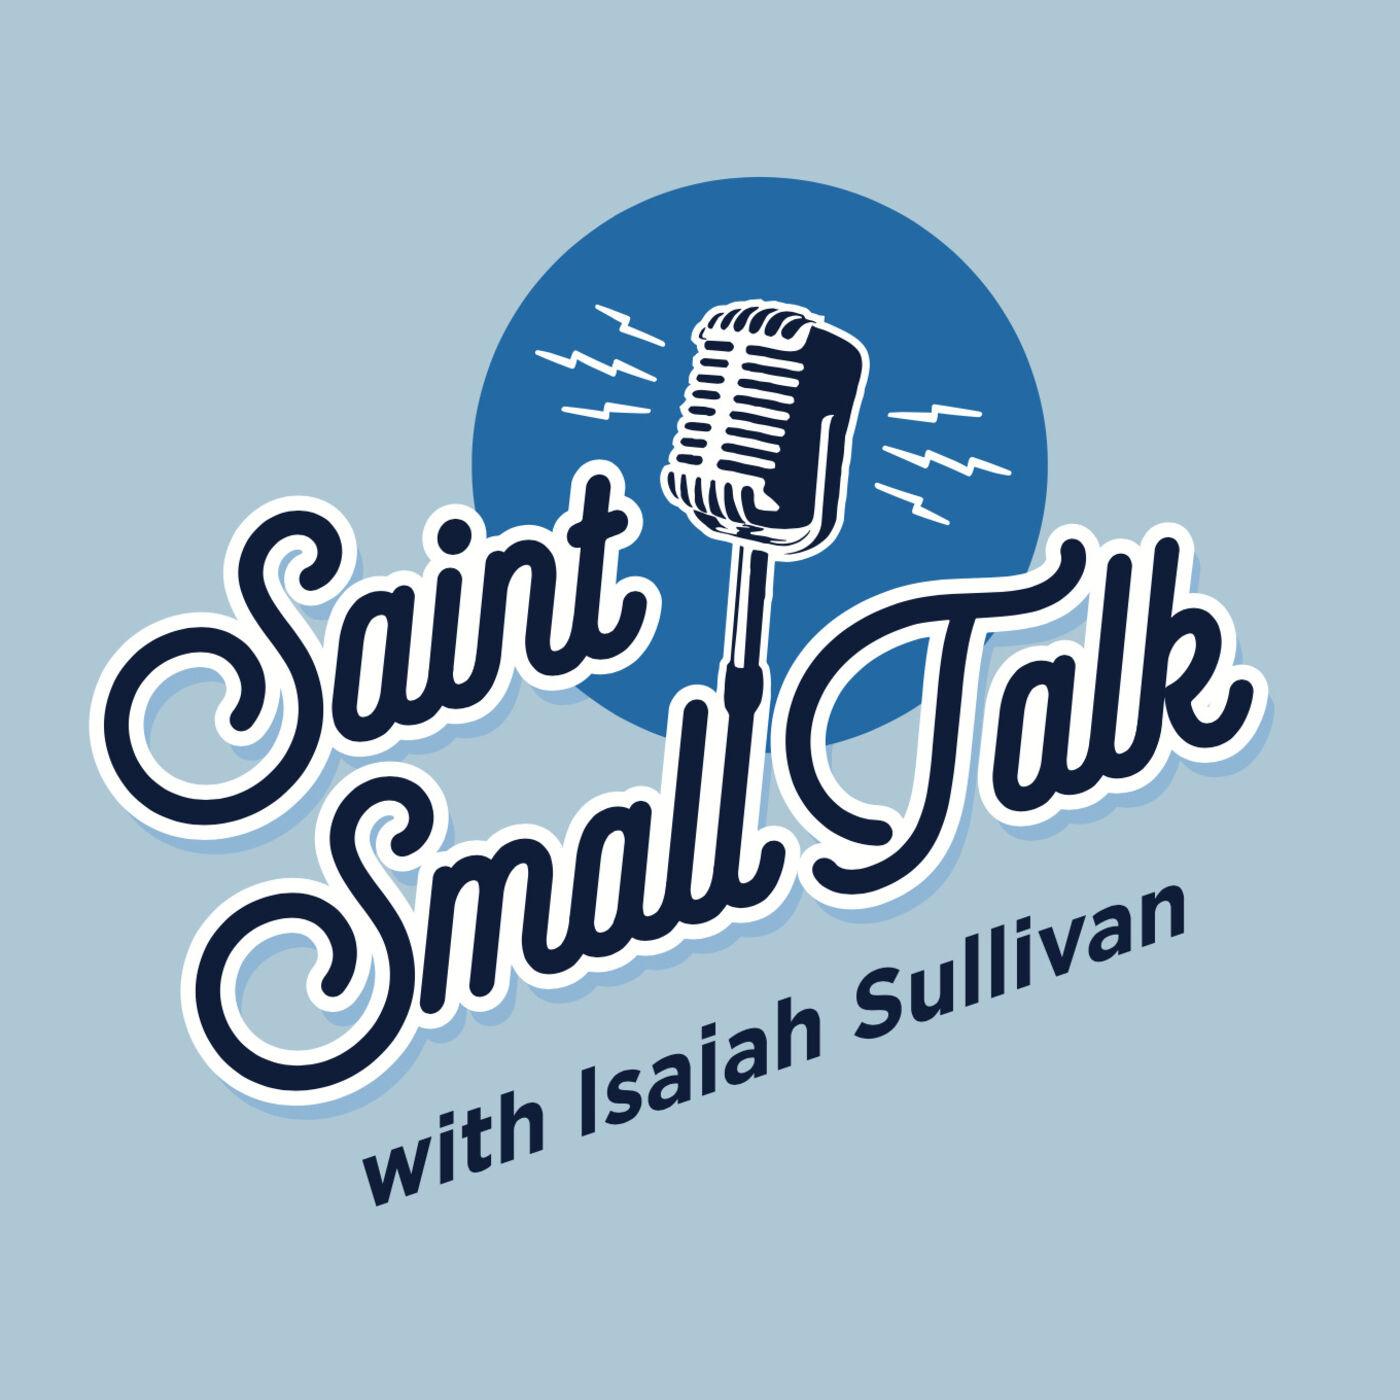 Show artwork for Saint Small Talk